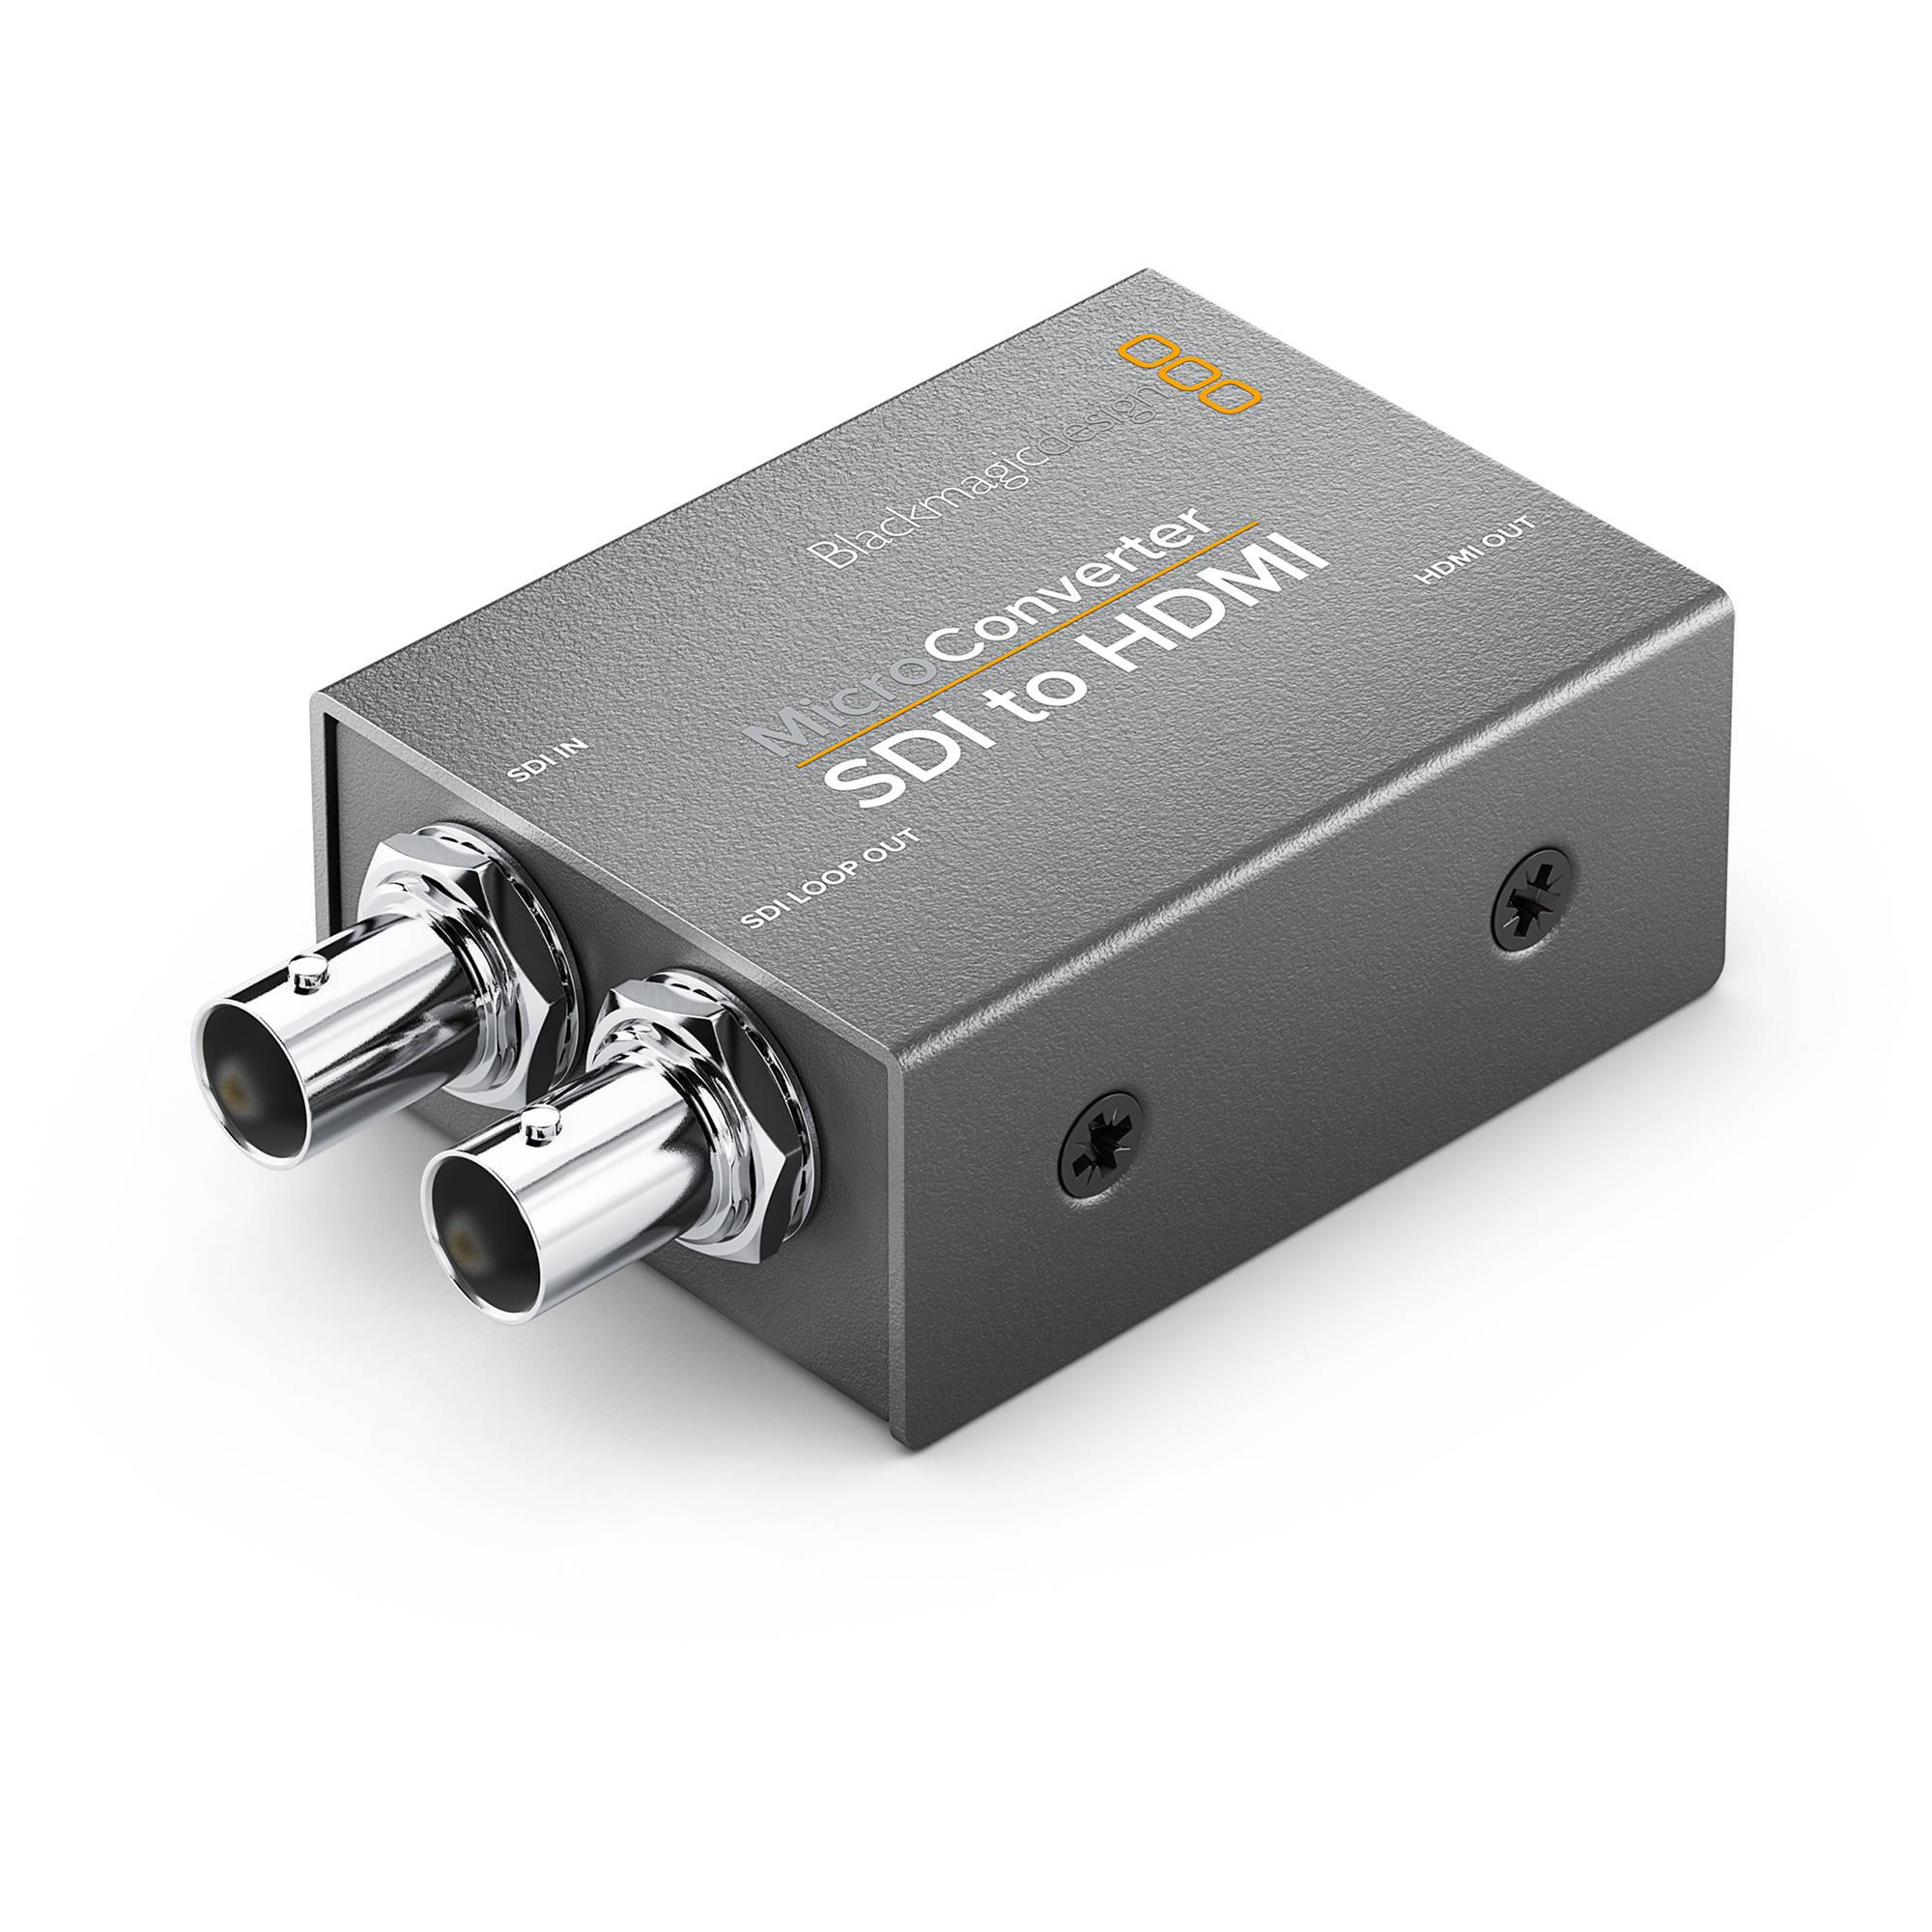 Blackmagic Design Micro Converter Sdi To Hdmi Convcmic Sh Wpsu